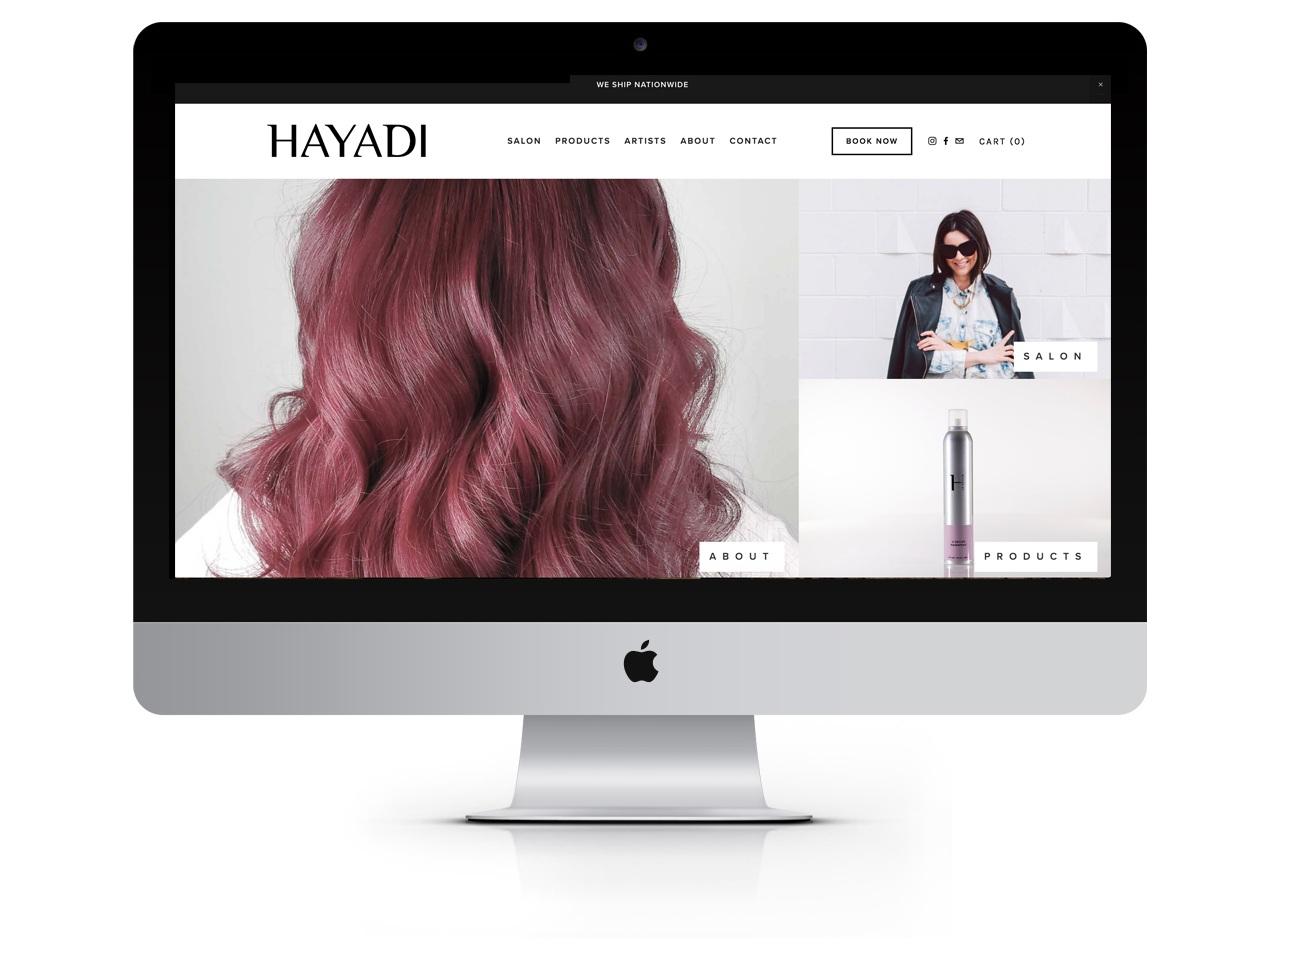 Hayadi+website+design